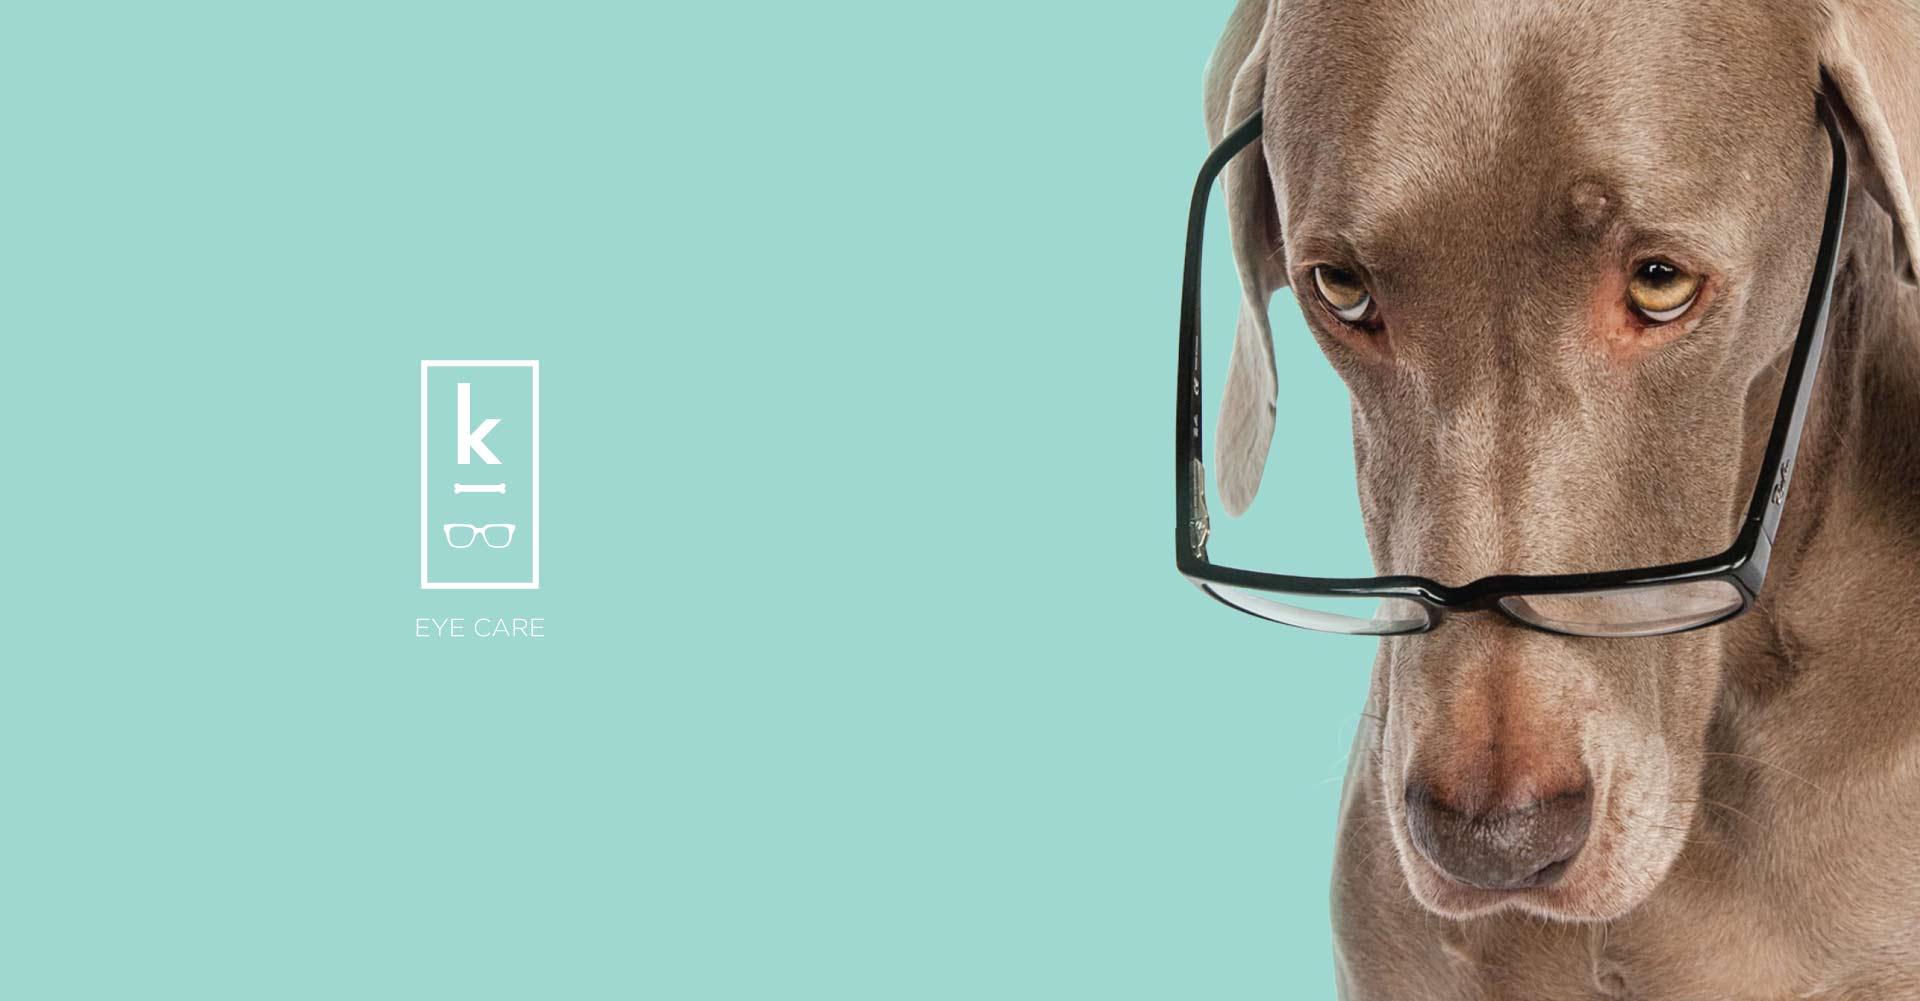 Creative_Retail_Packaging_Branding_Identity_Design_Klementime_15.jpg